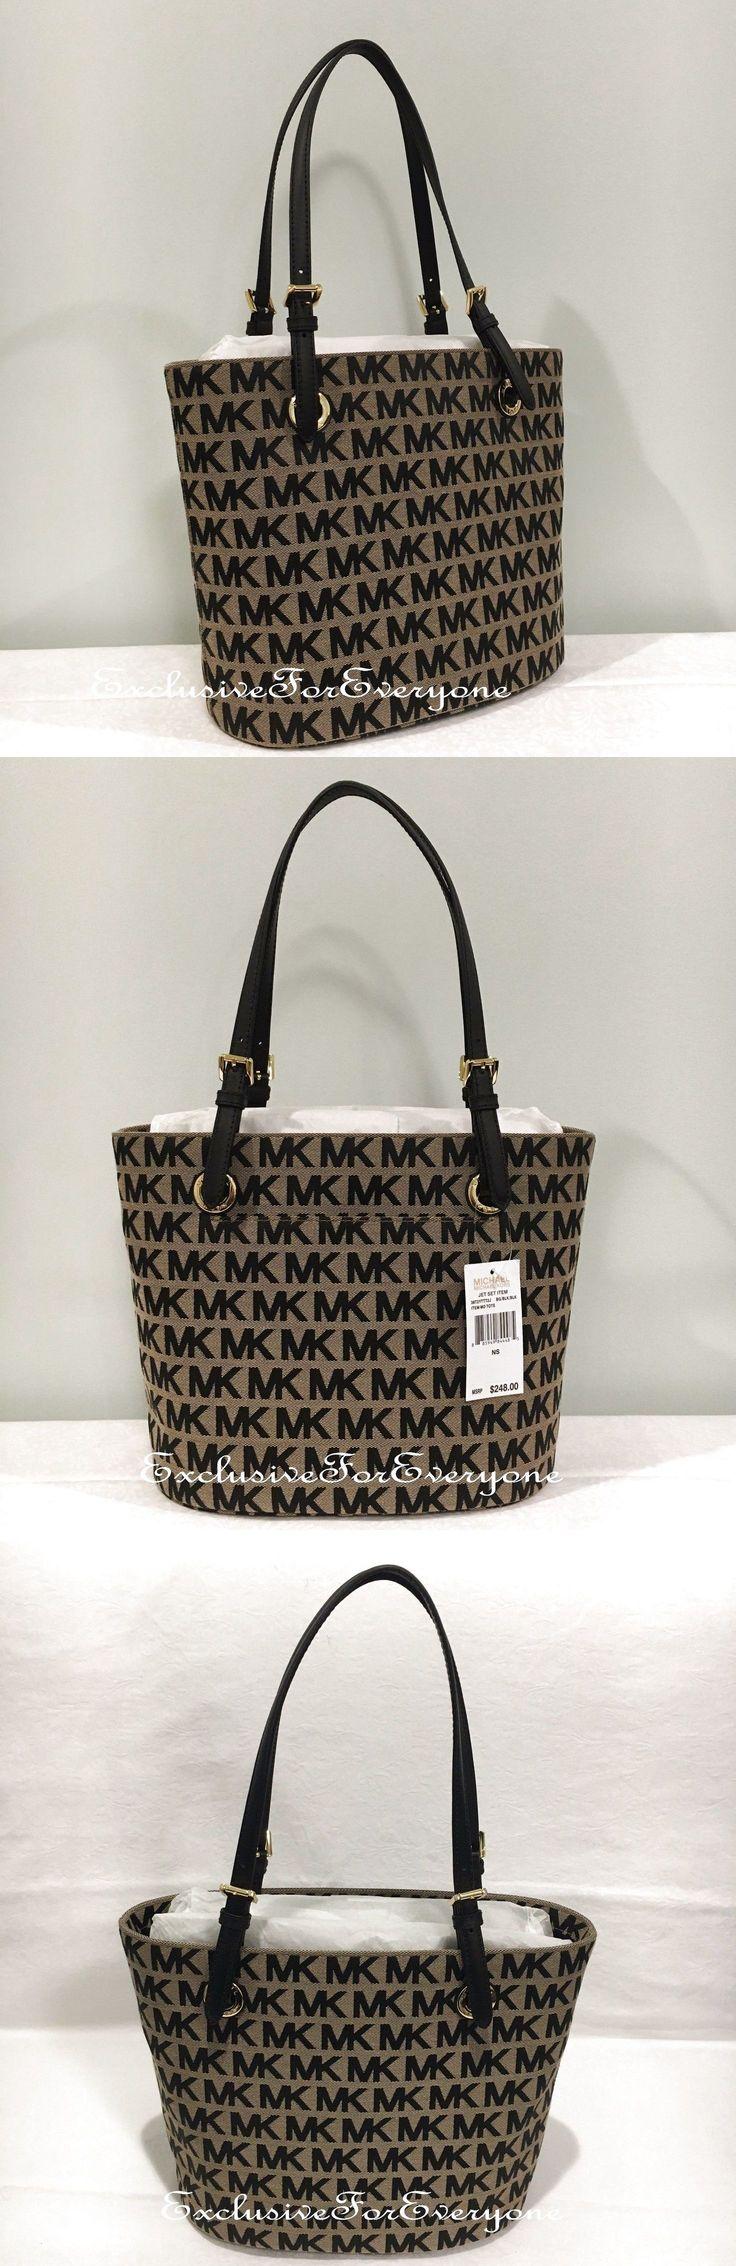 NWT Michael Kors Jet Set Medium Tote Bag Purse Signature MK Beige Black $248 $119.99